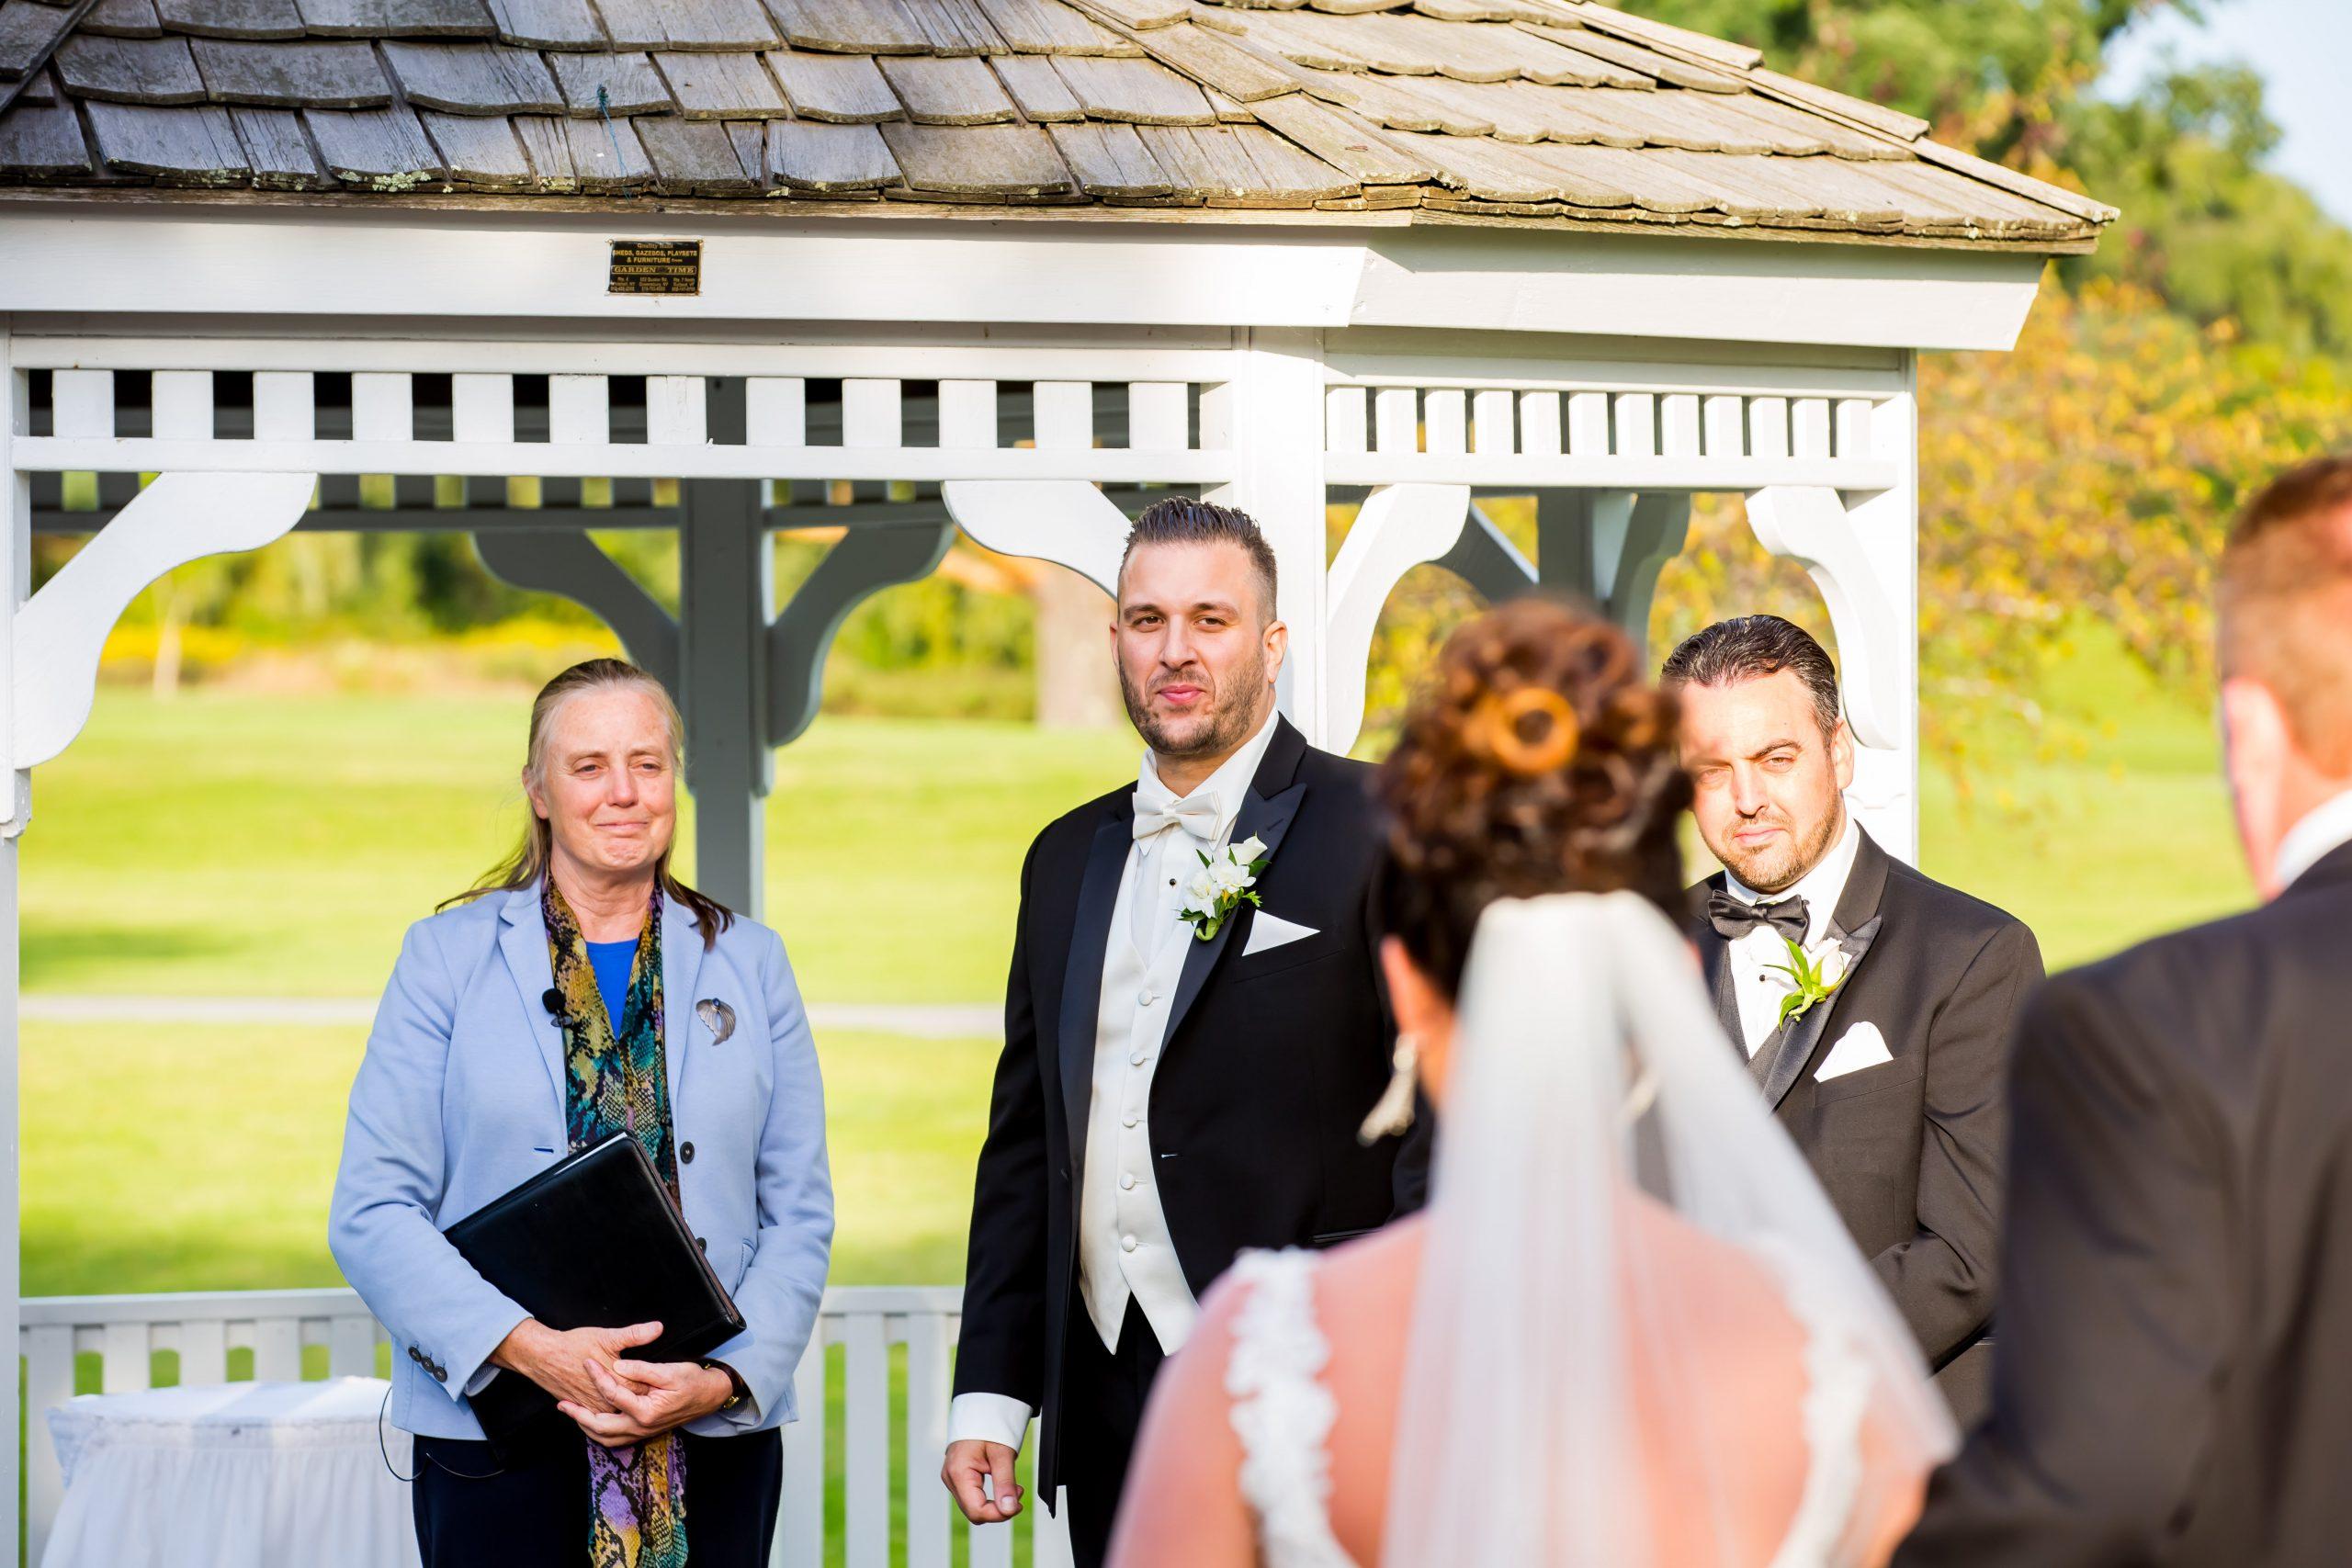 Victori_Rob_Mohawk River Country Club Wedding-28.jpg